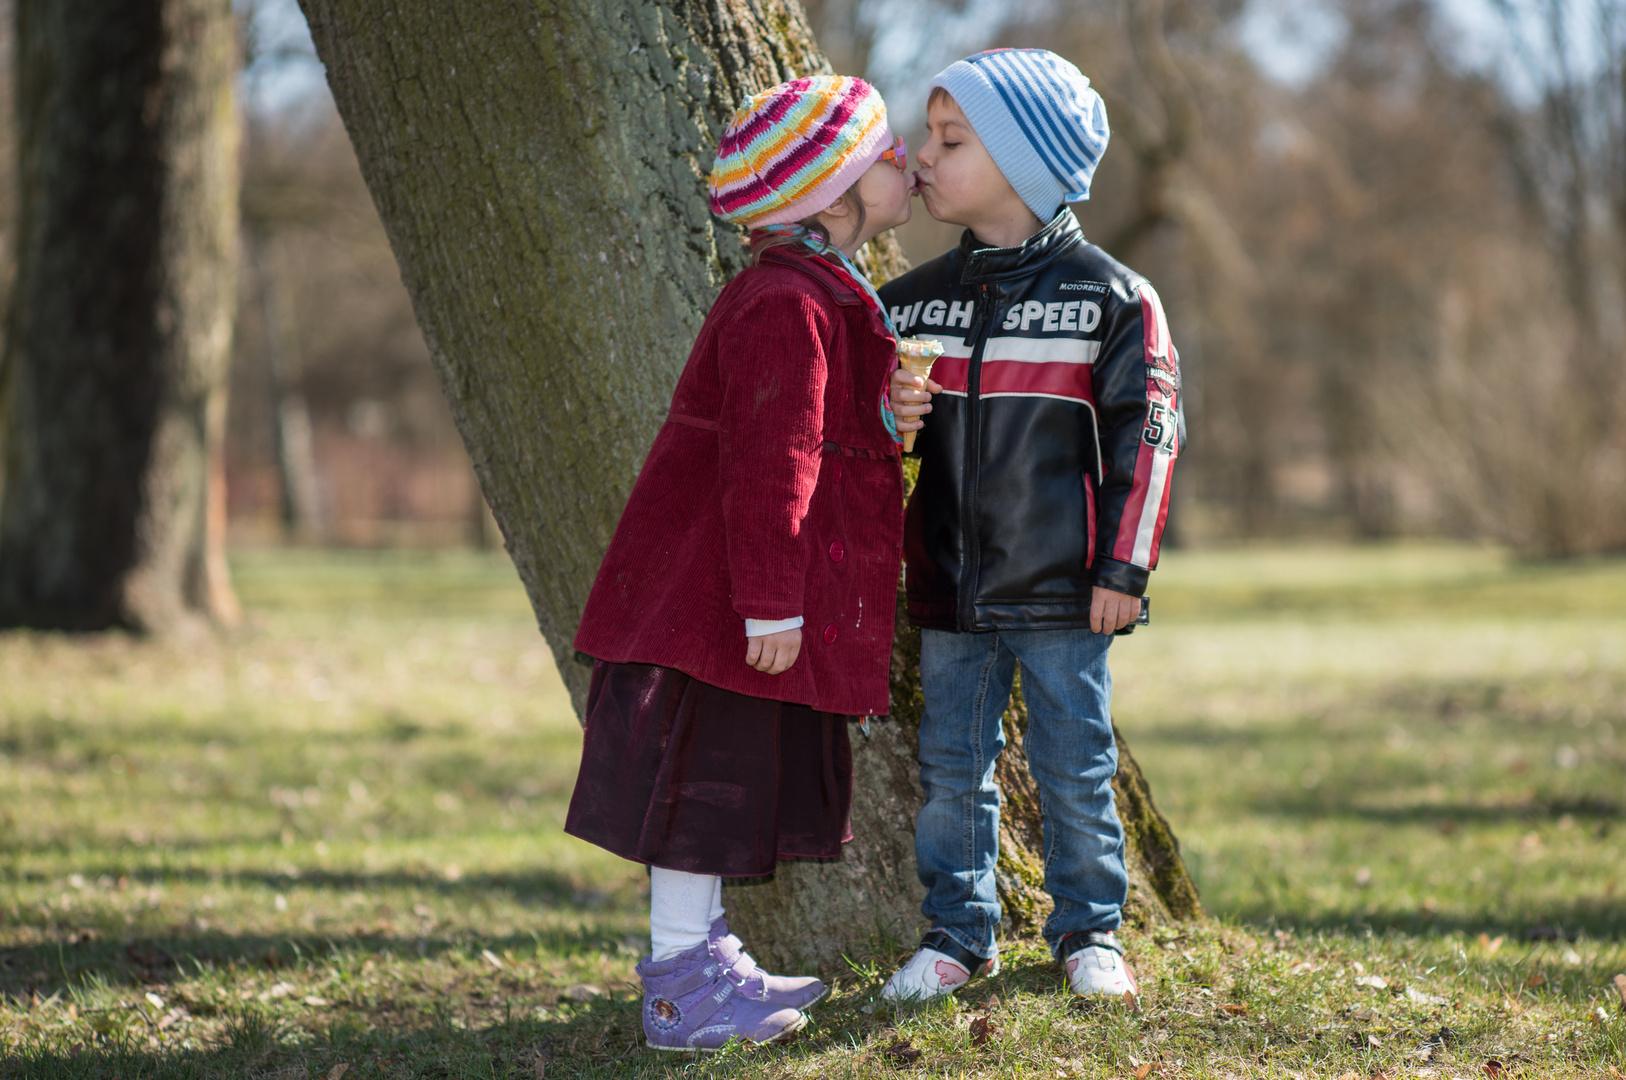 kiss ;)